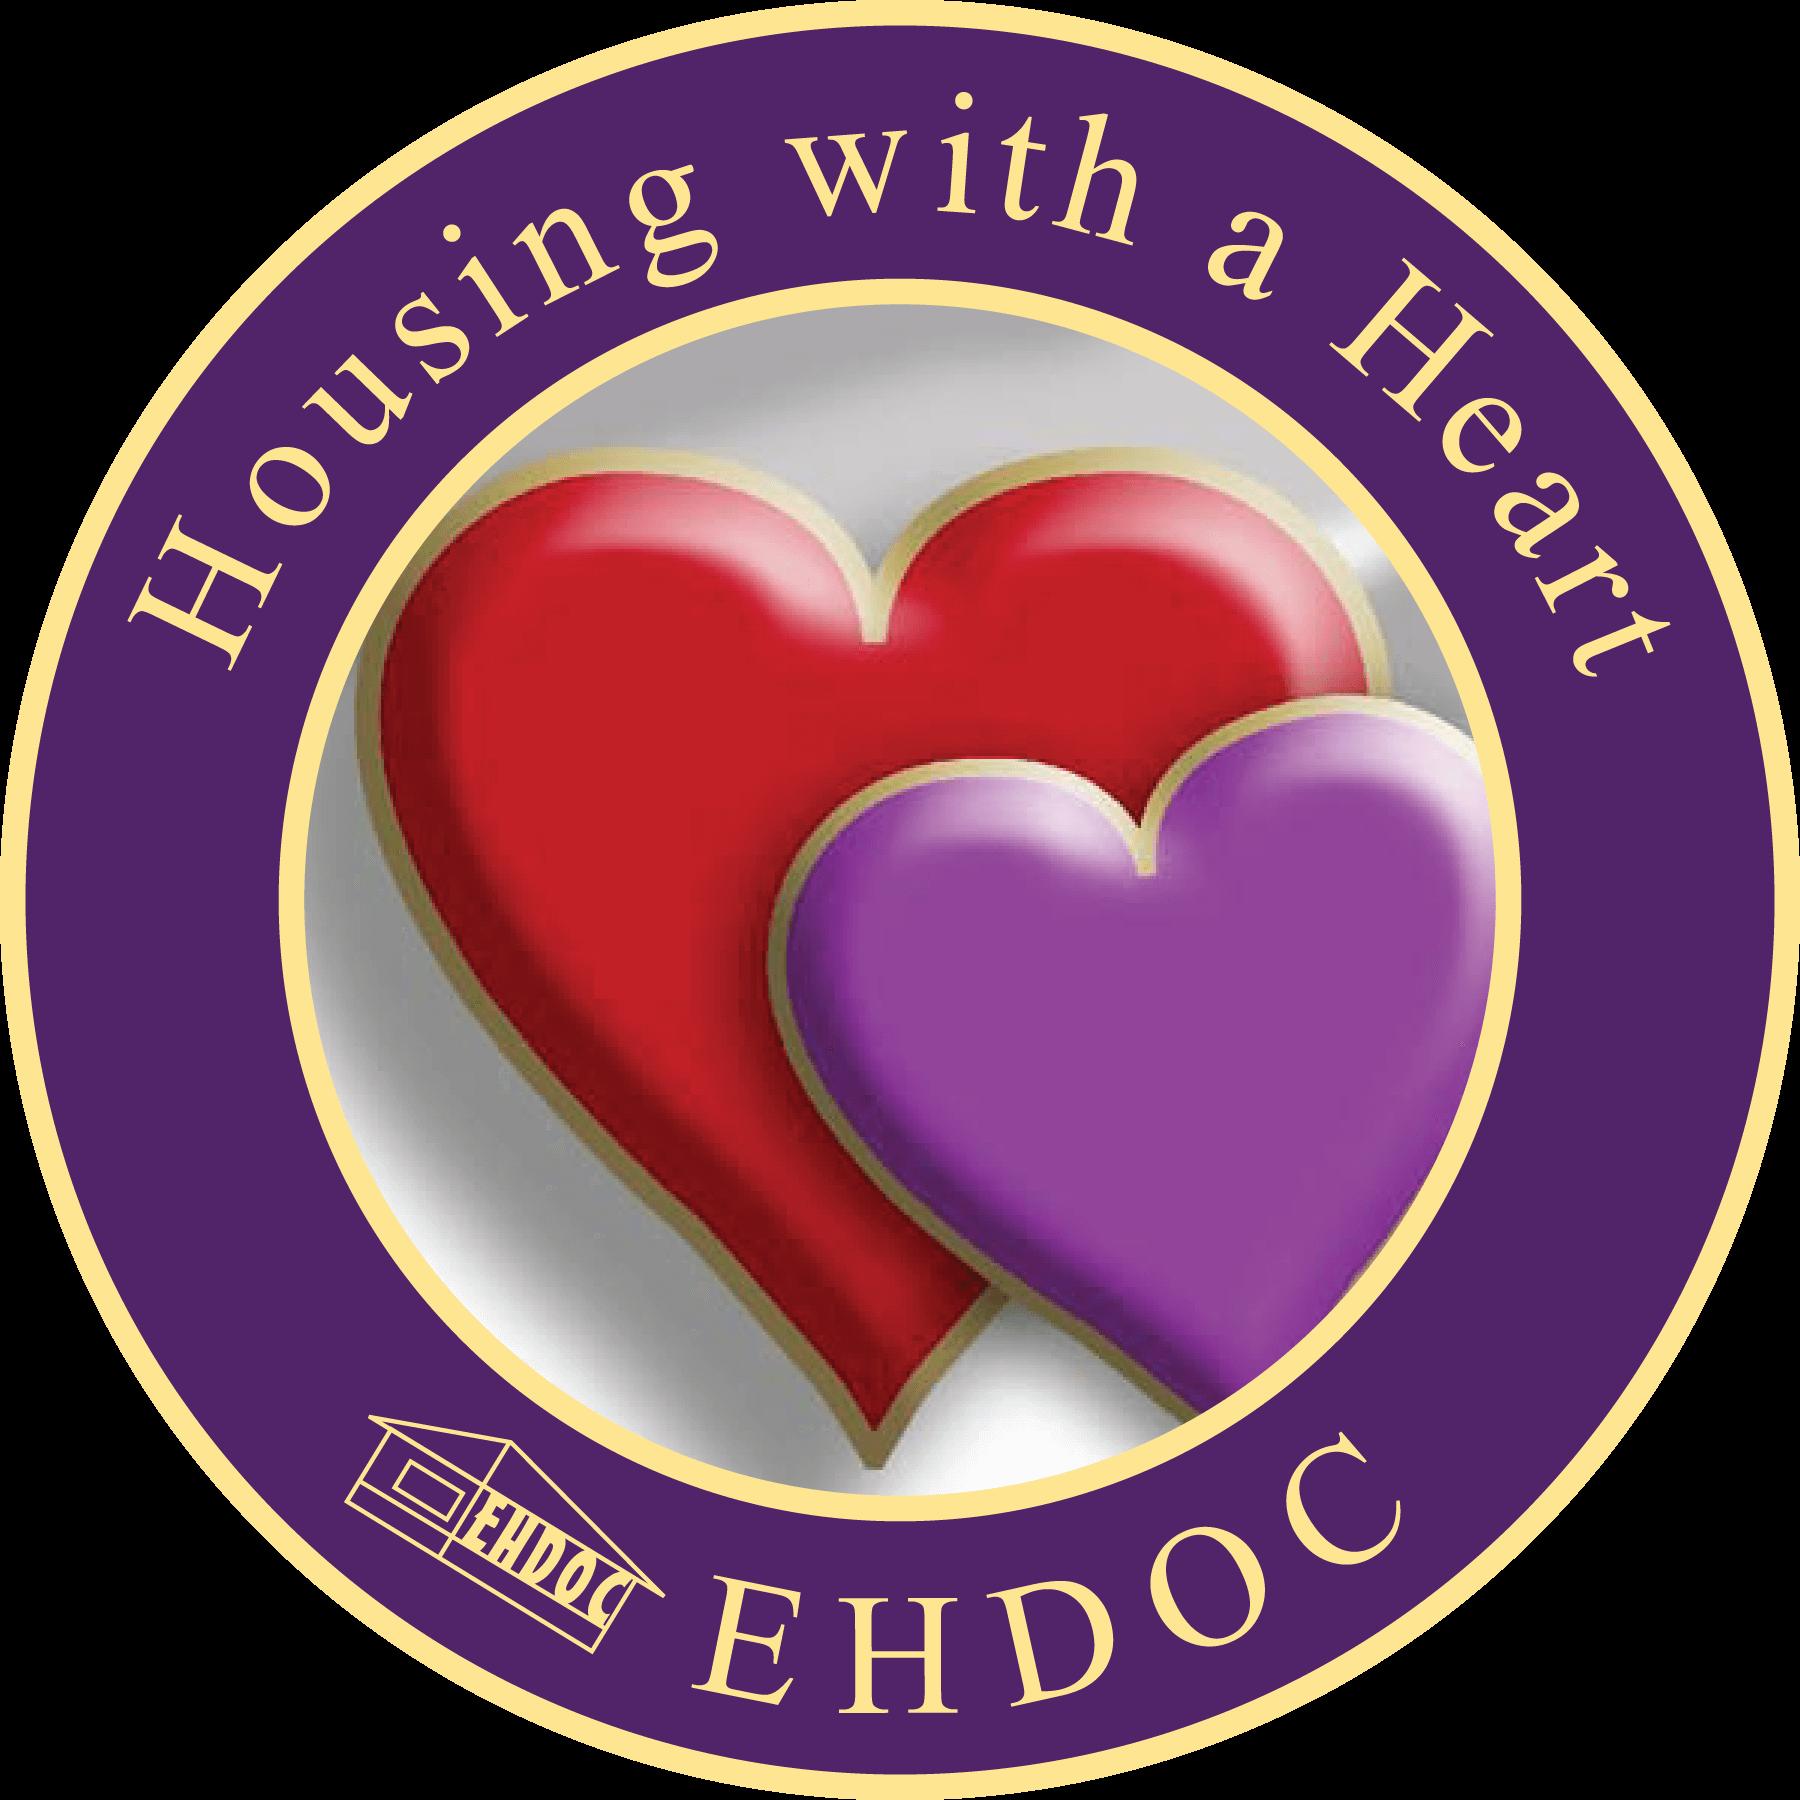 EHDOC heart LOGO transparent for diane